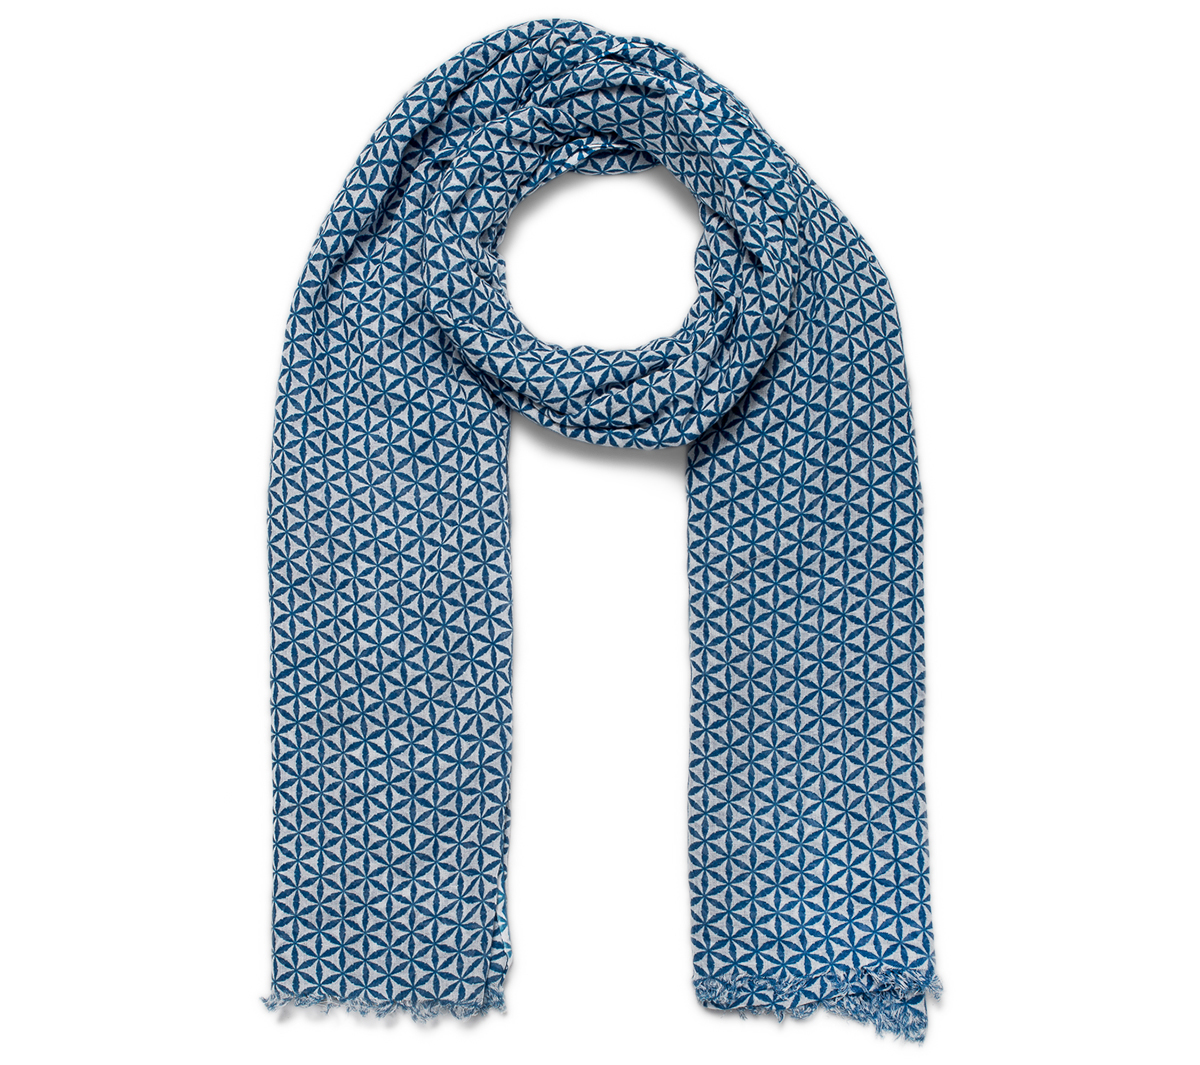 Bleu Imprimé Foulard Blanc Eram Et n0PwOk